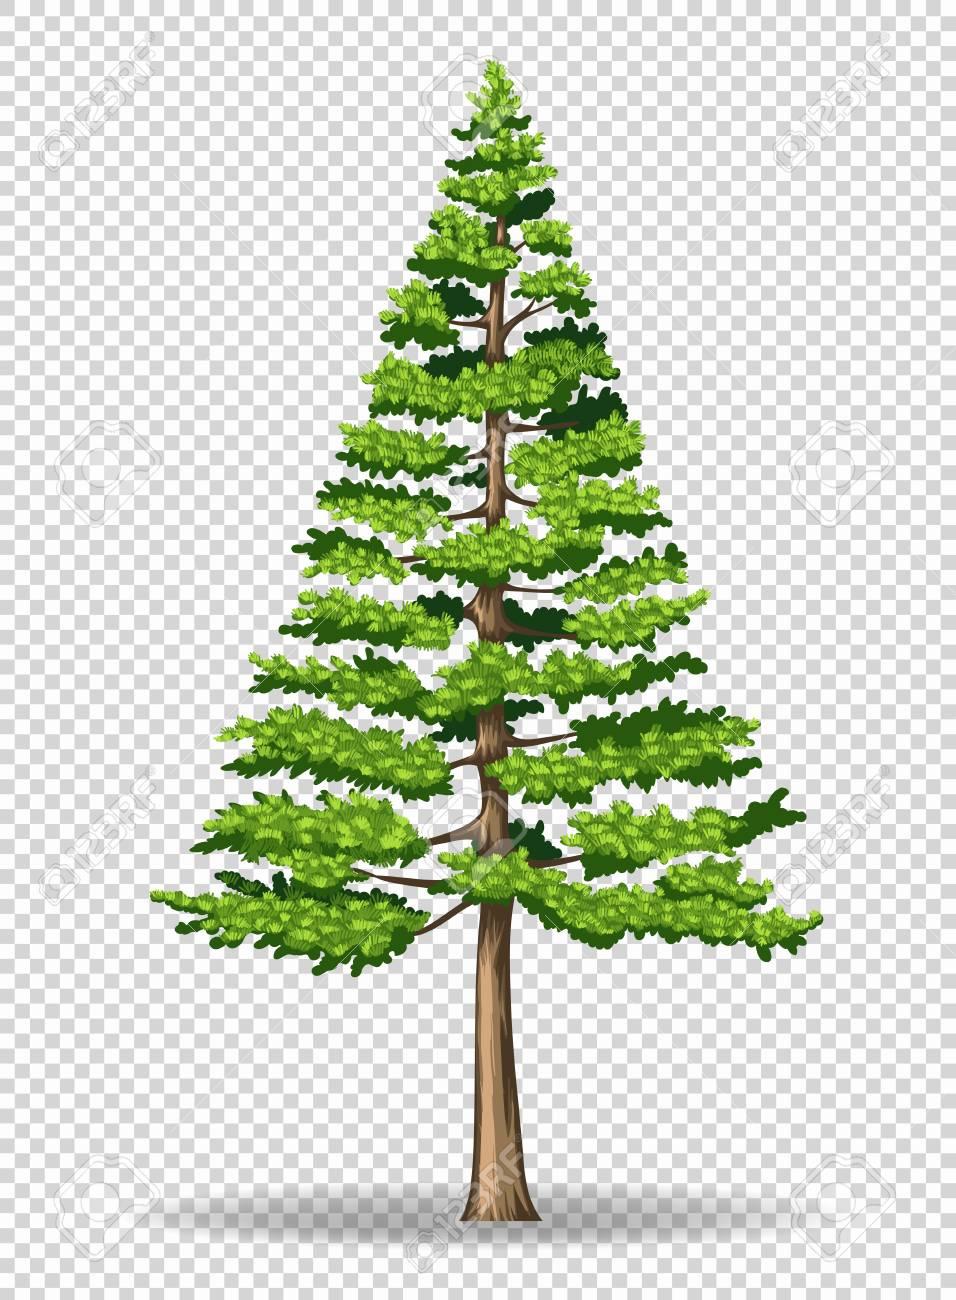 medium resolution of pine tree on transparent background illustration stock vector 78000092